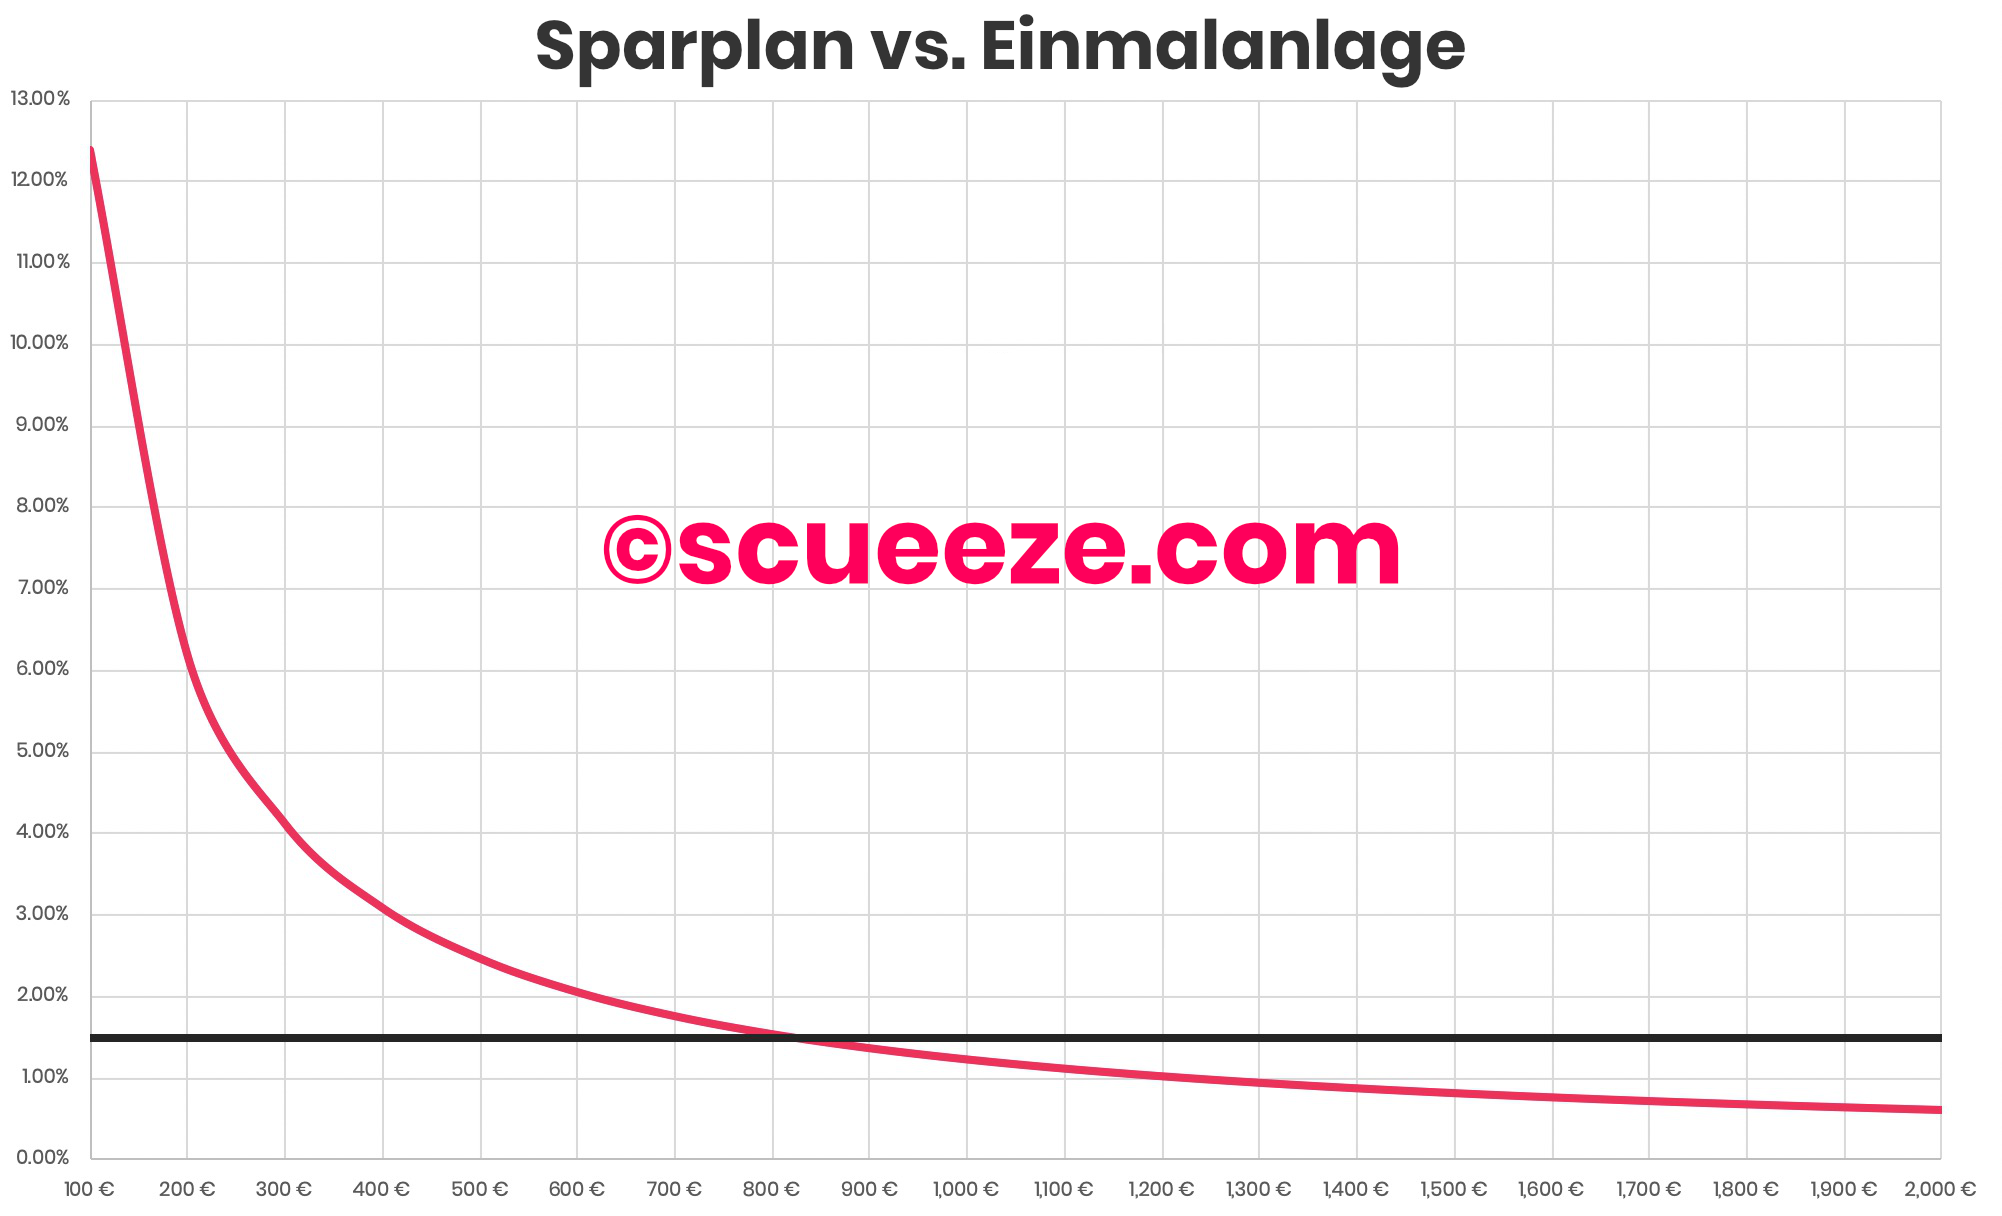 ETF: Sparplan vs. Einmalanlage